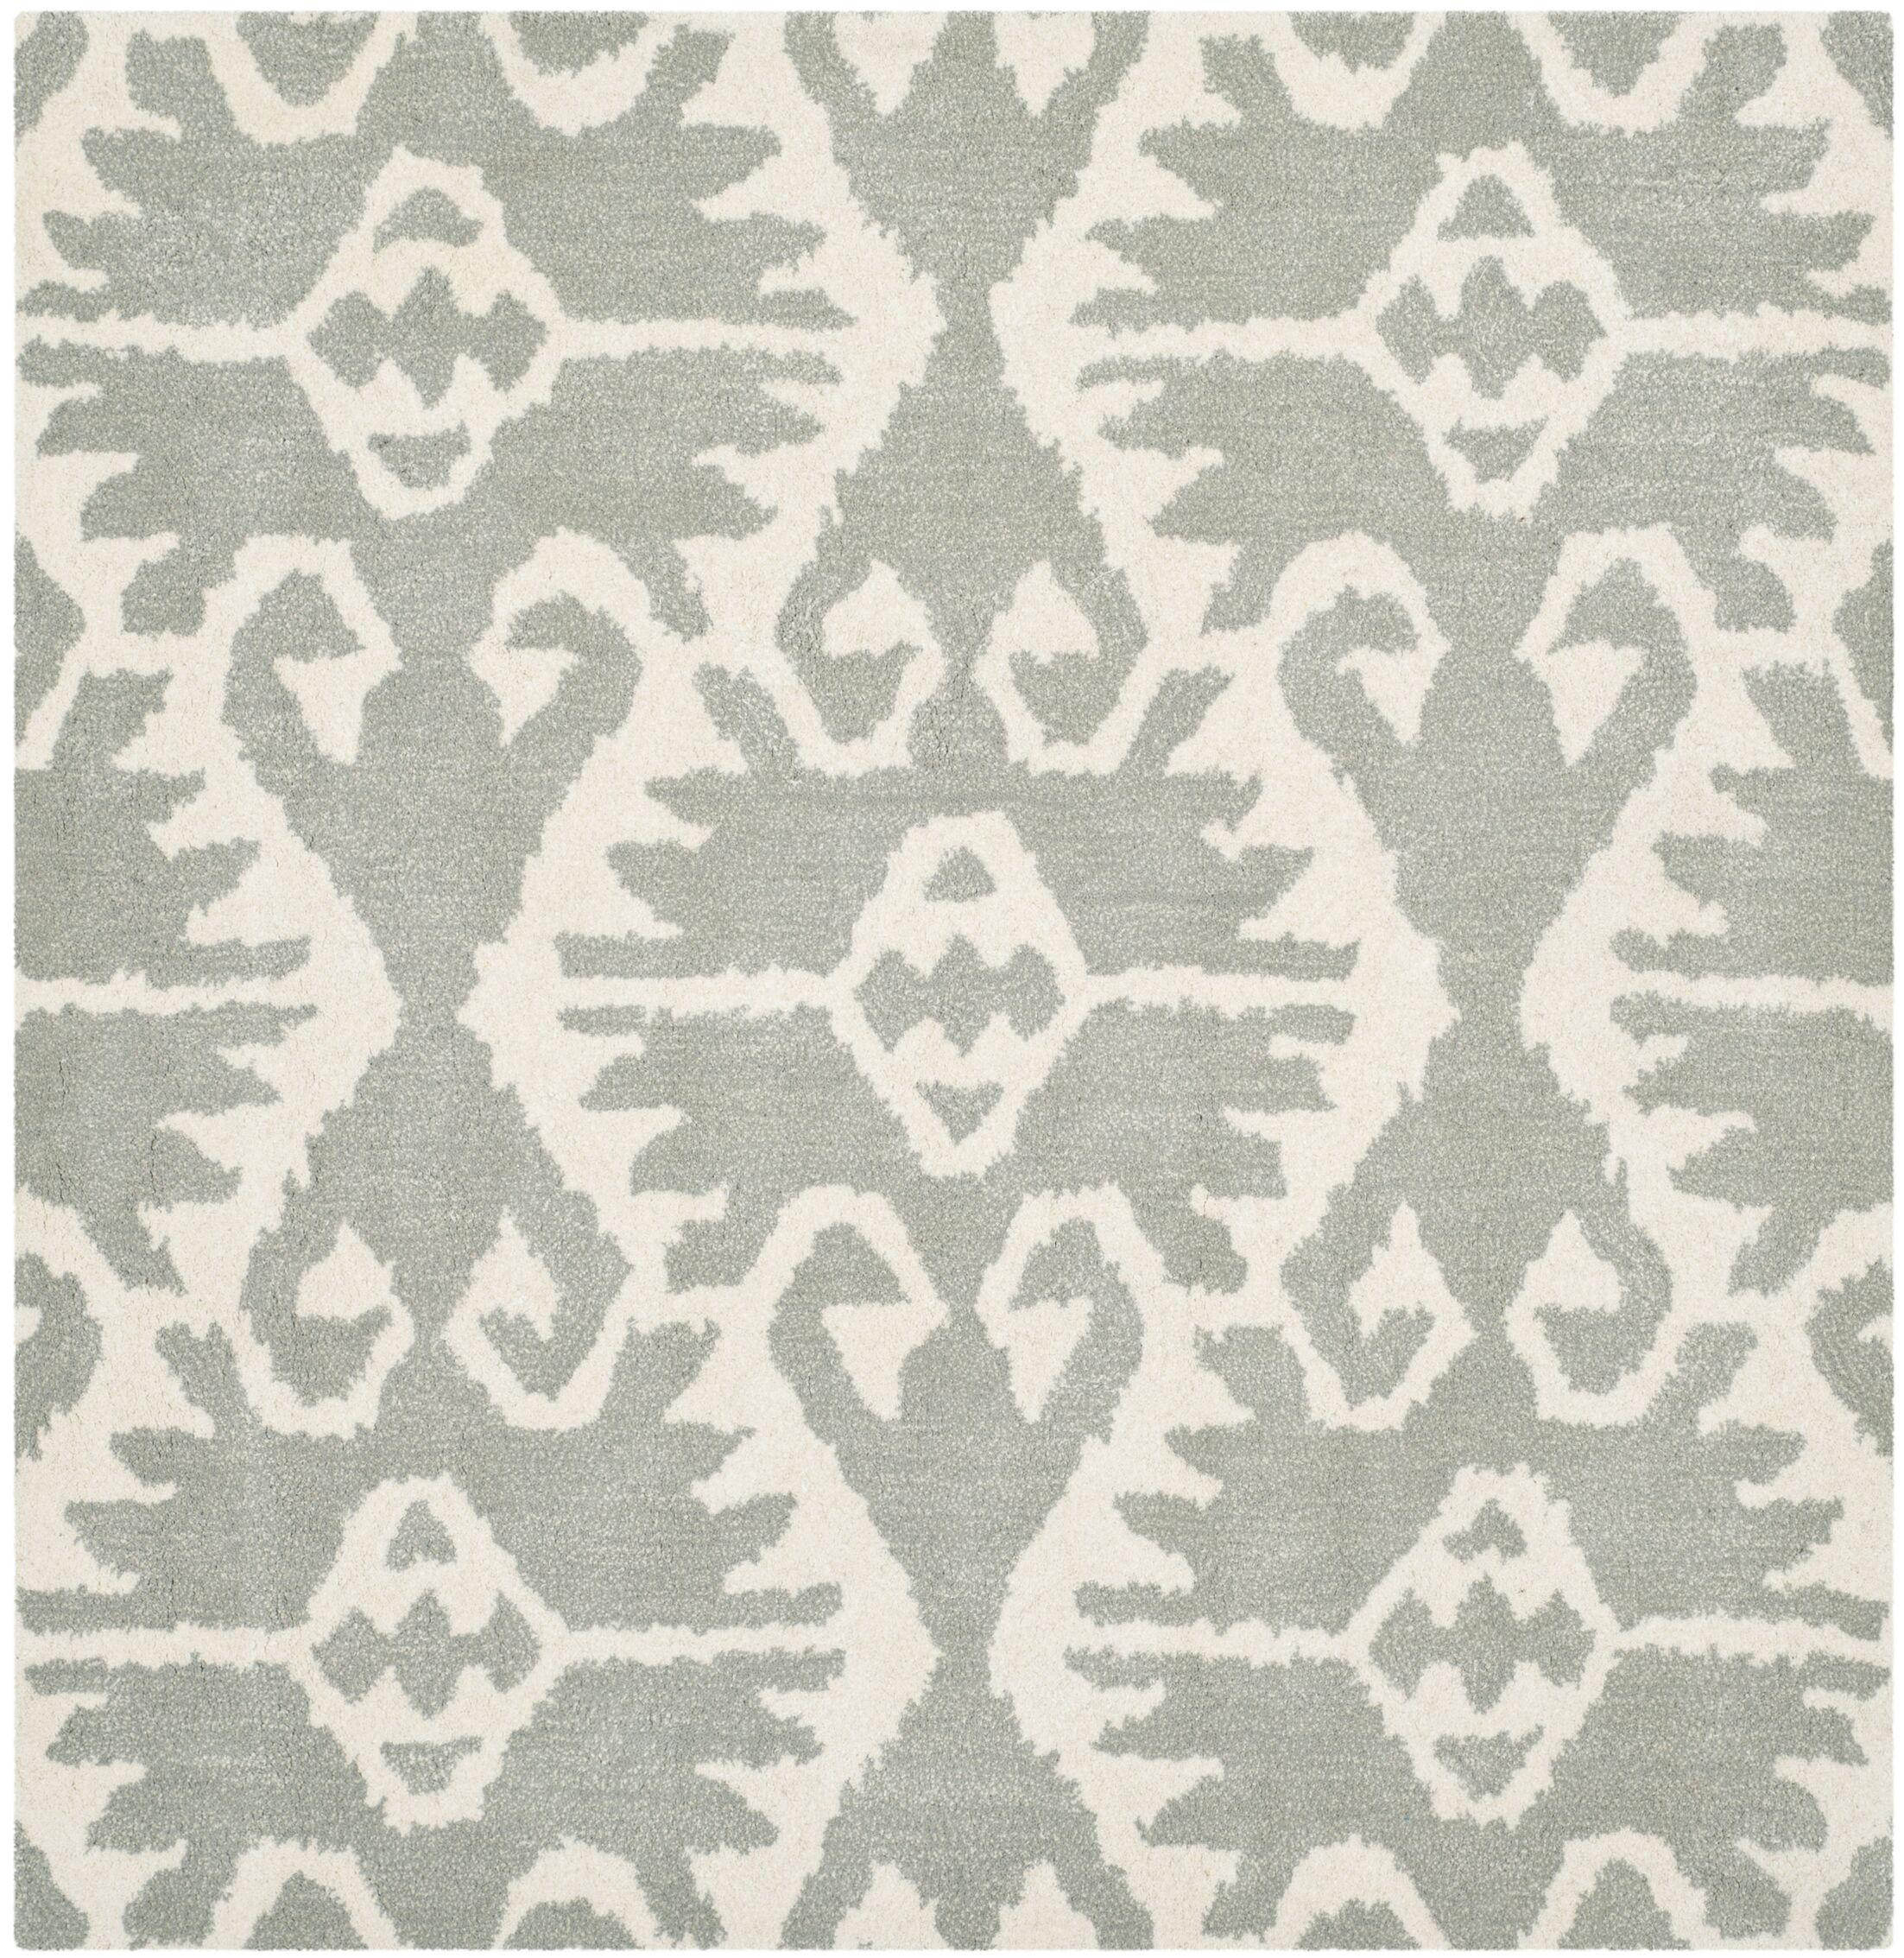 Kouerga Gray/Ivory Area Rug Rug Size: Square 5'